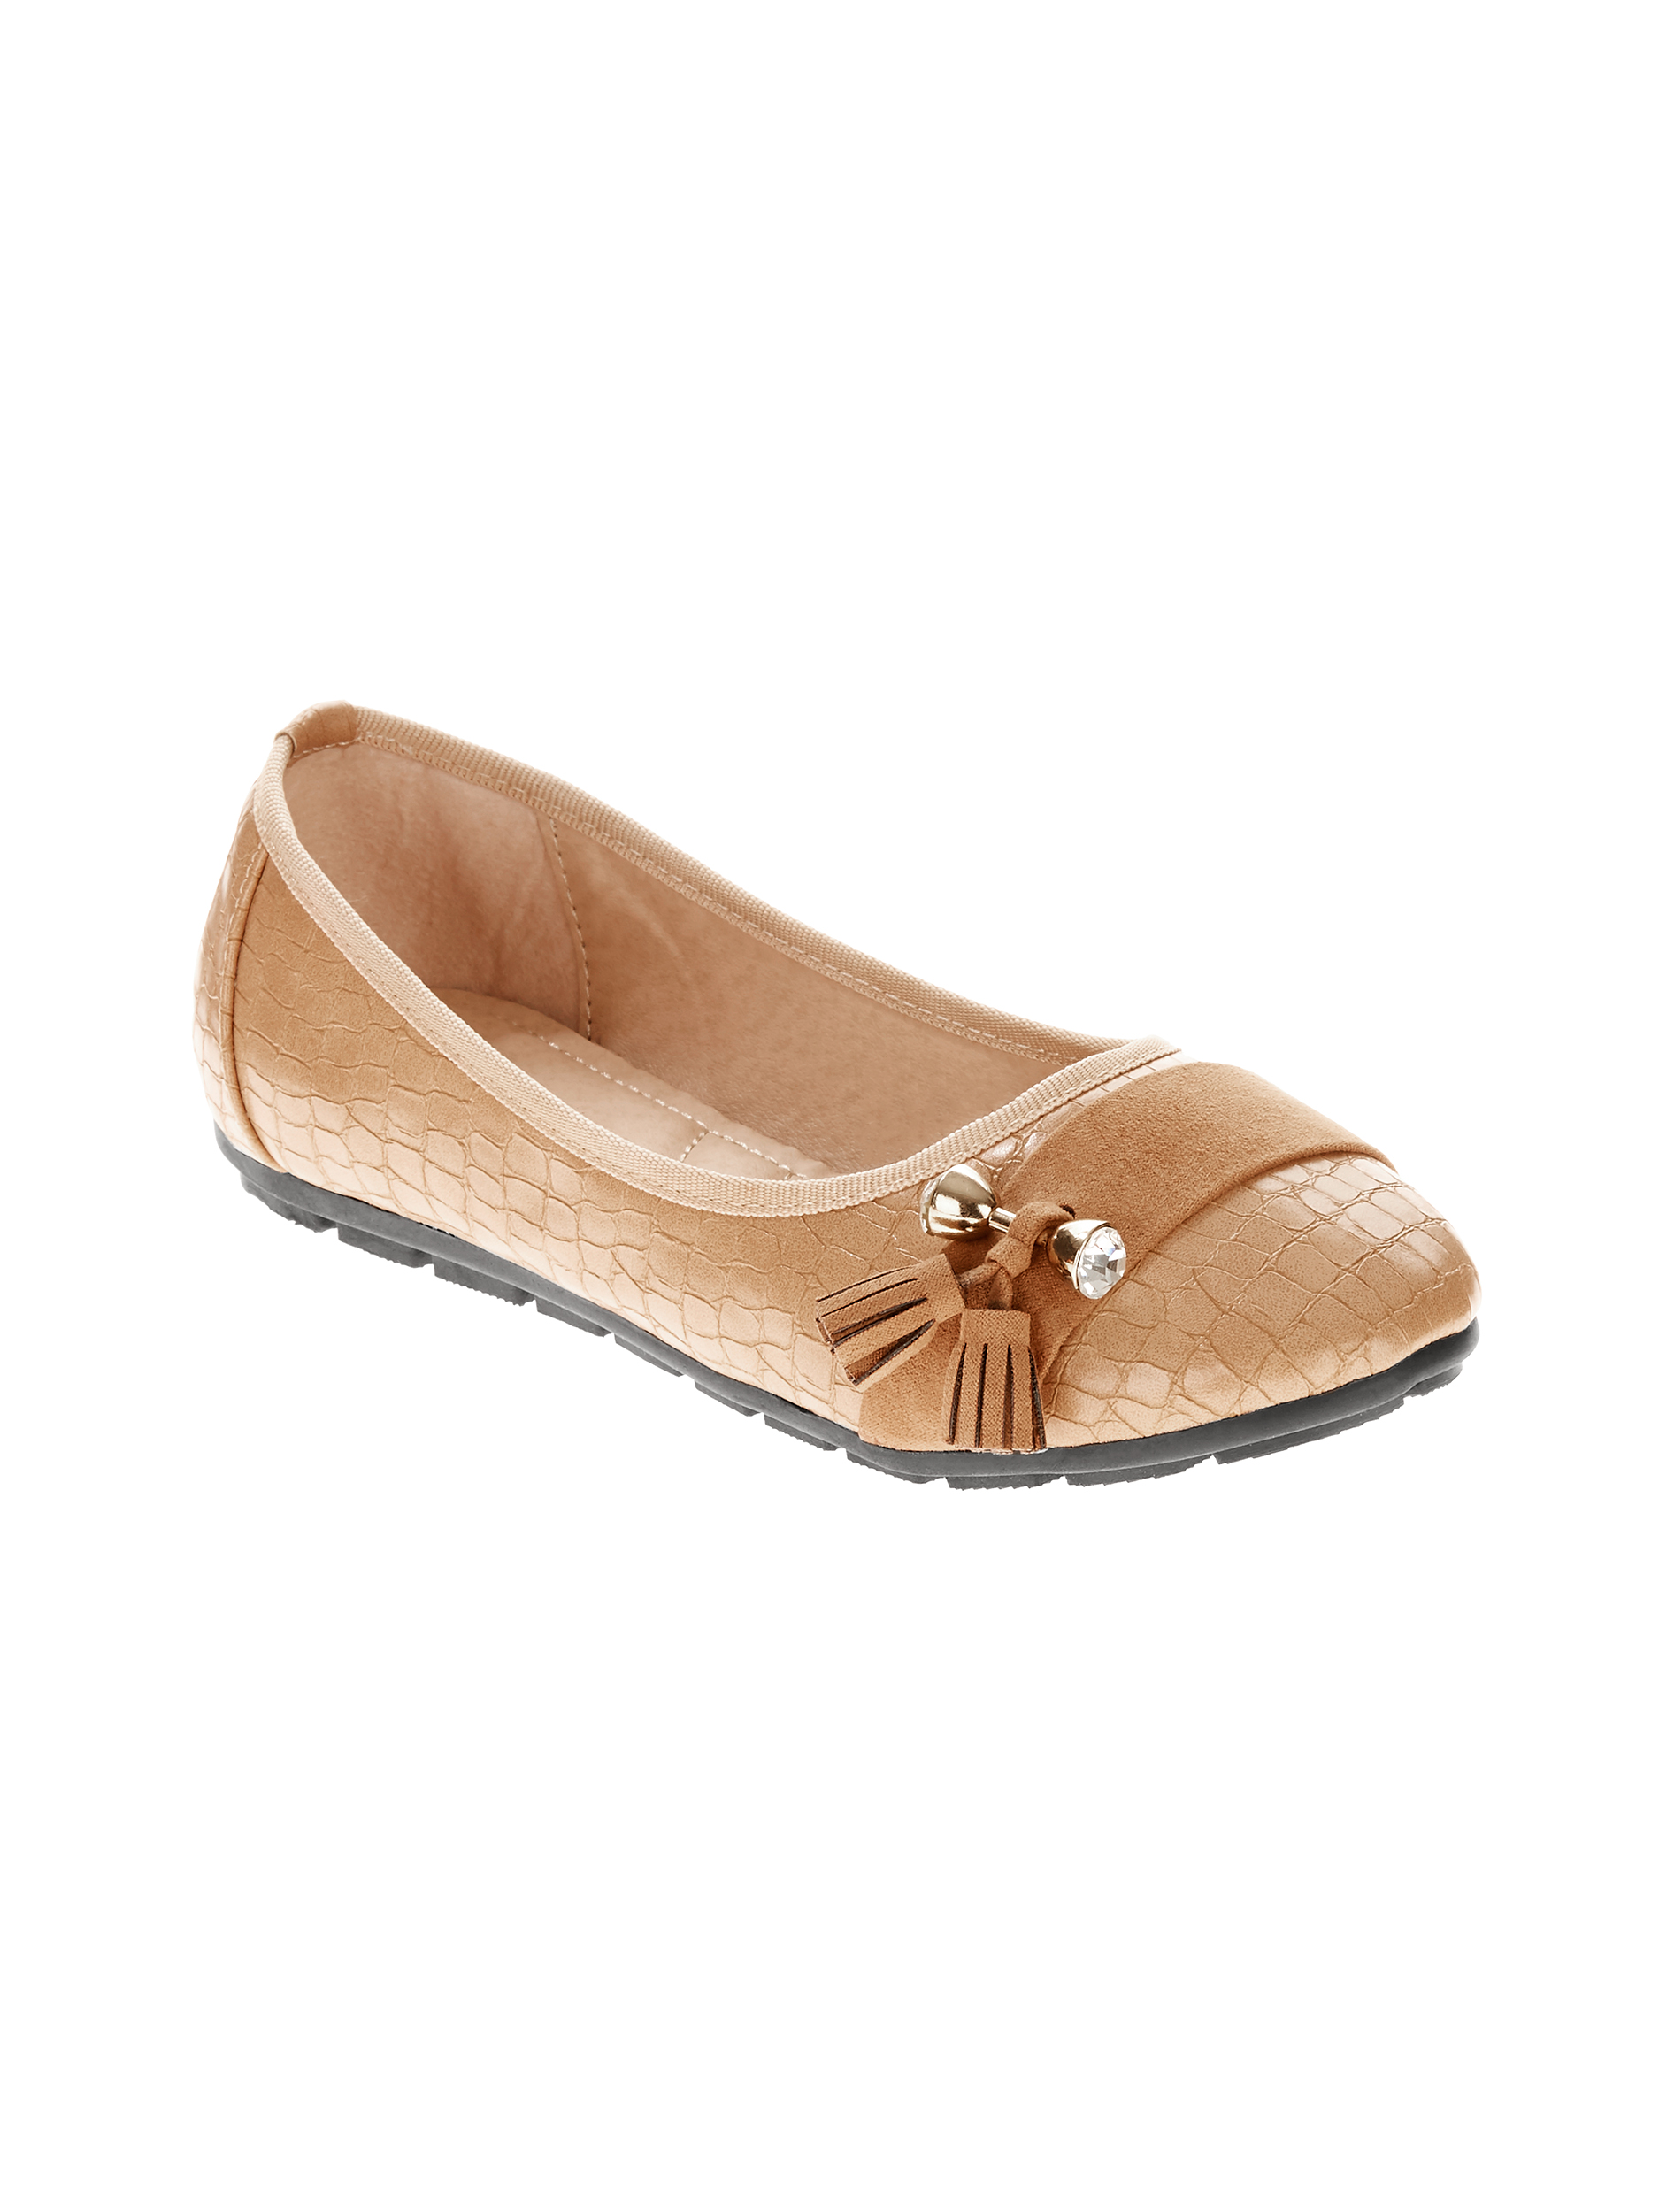 Victoria K Women's Side Tassels With Rhinestone Ornament On Croc Textured Ballerina Flats